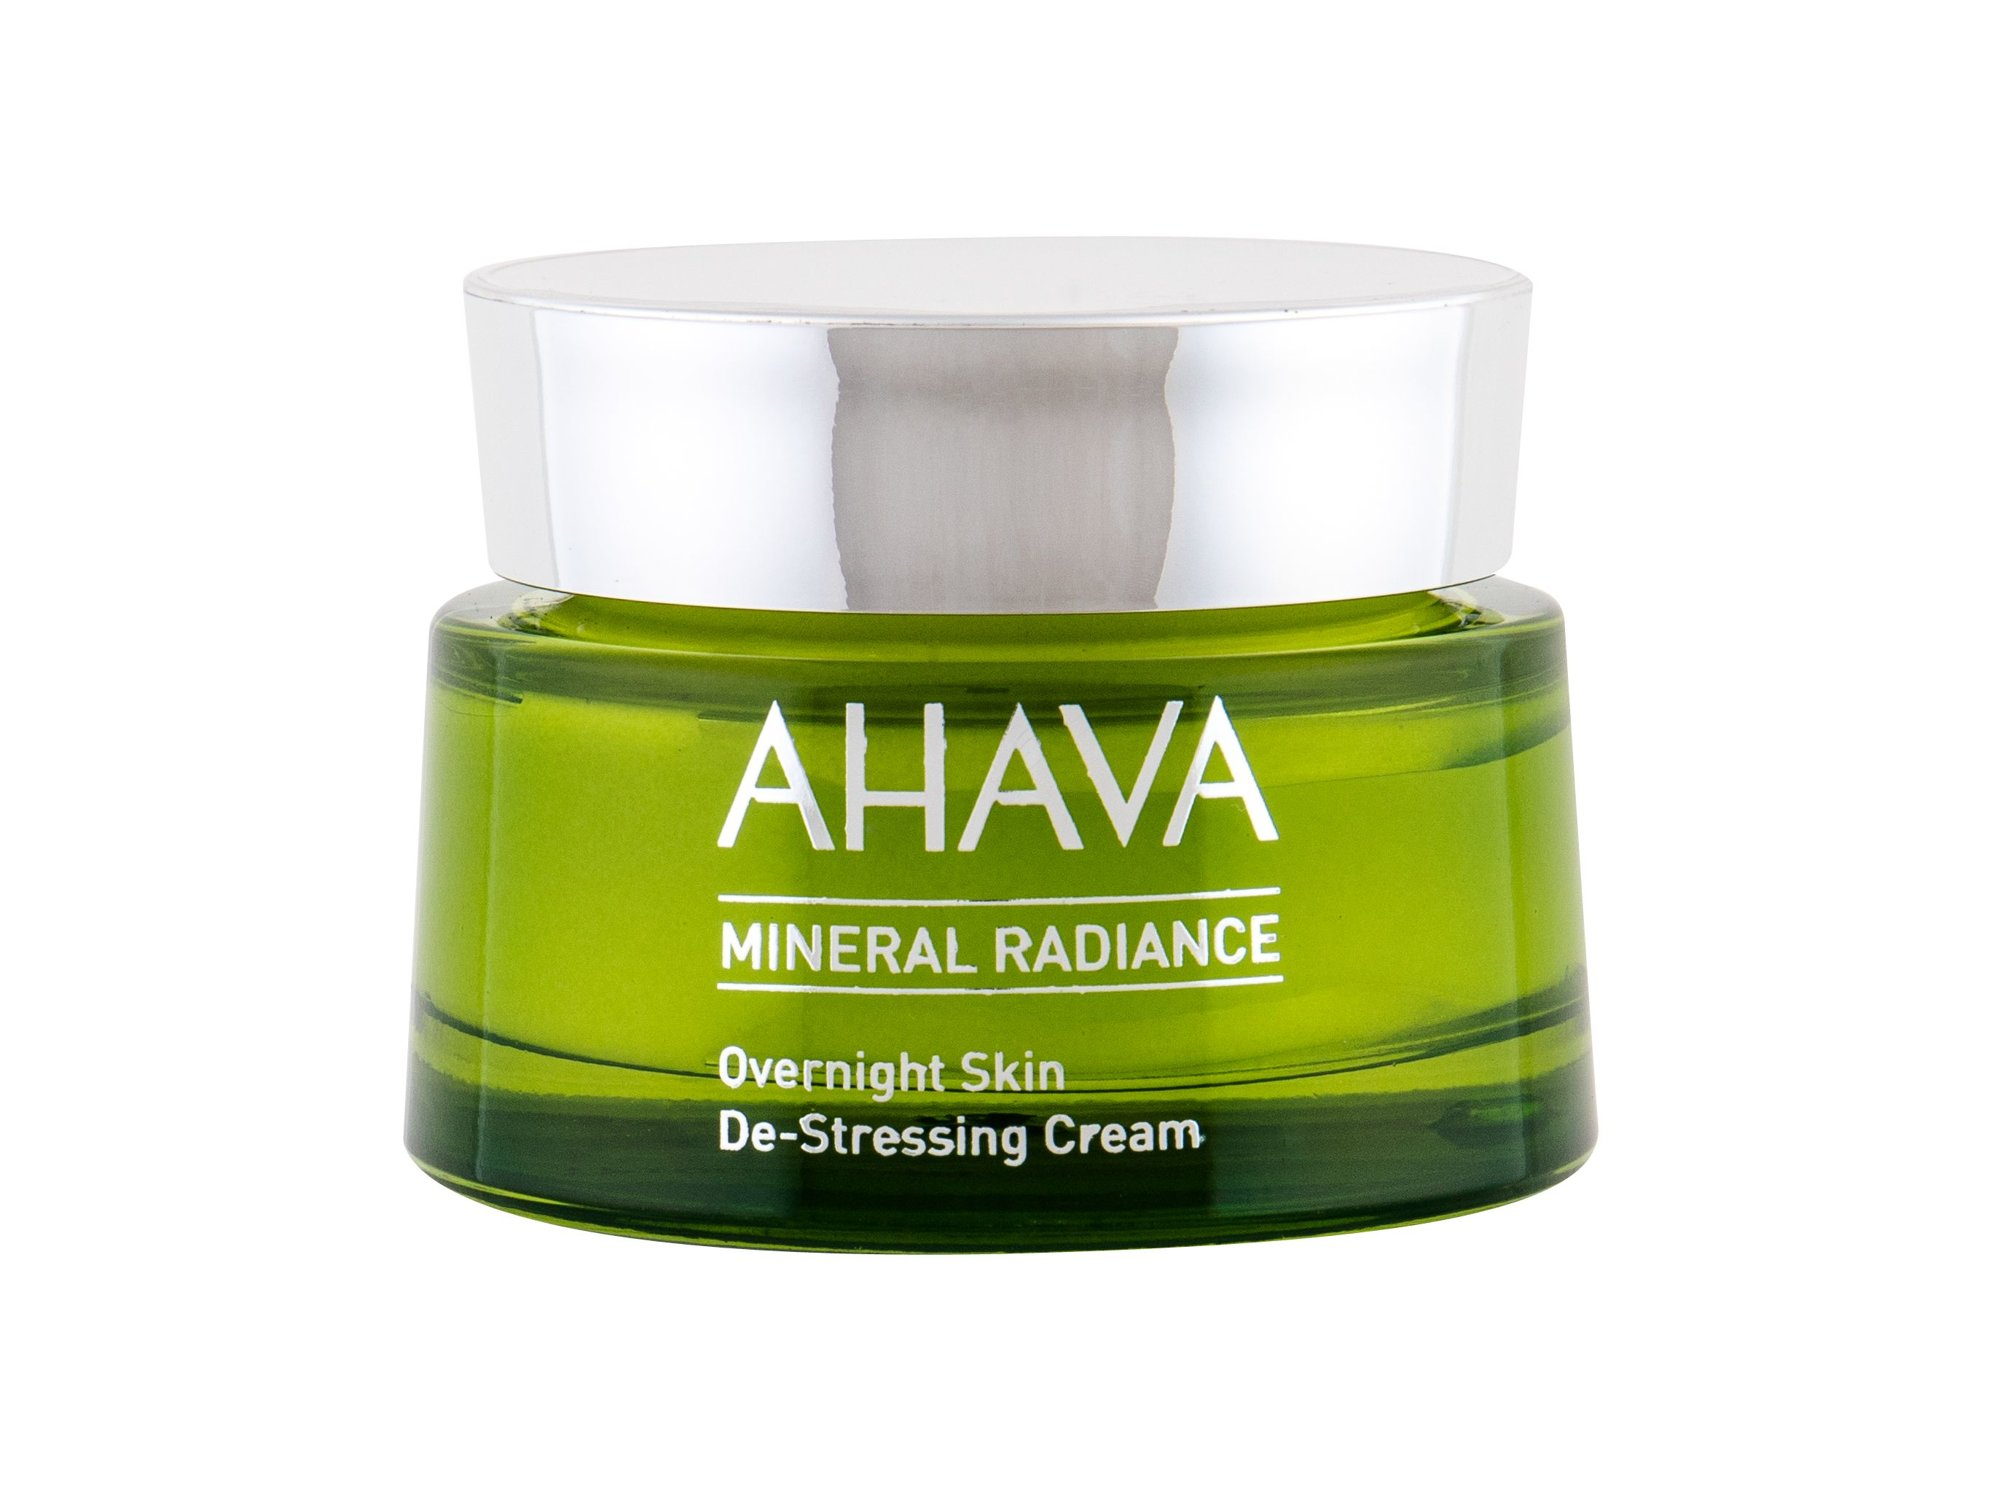 AHAVA Mineral Radiance Night Skin Cream 50ml  Overnight Skin